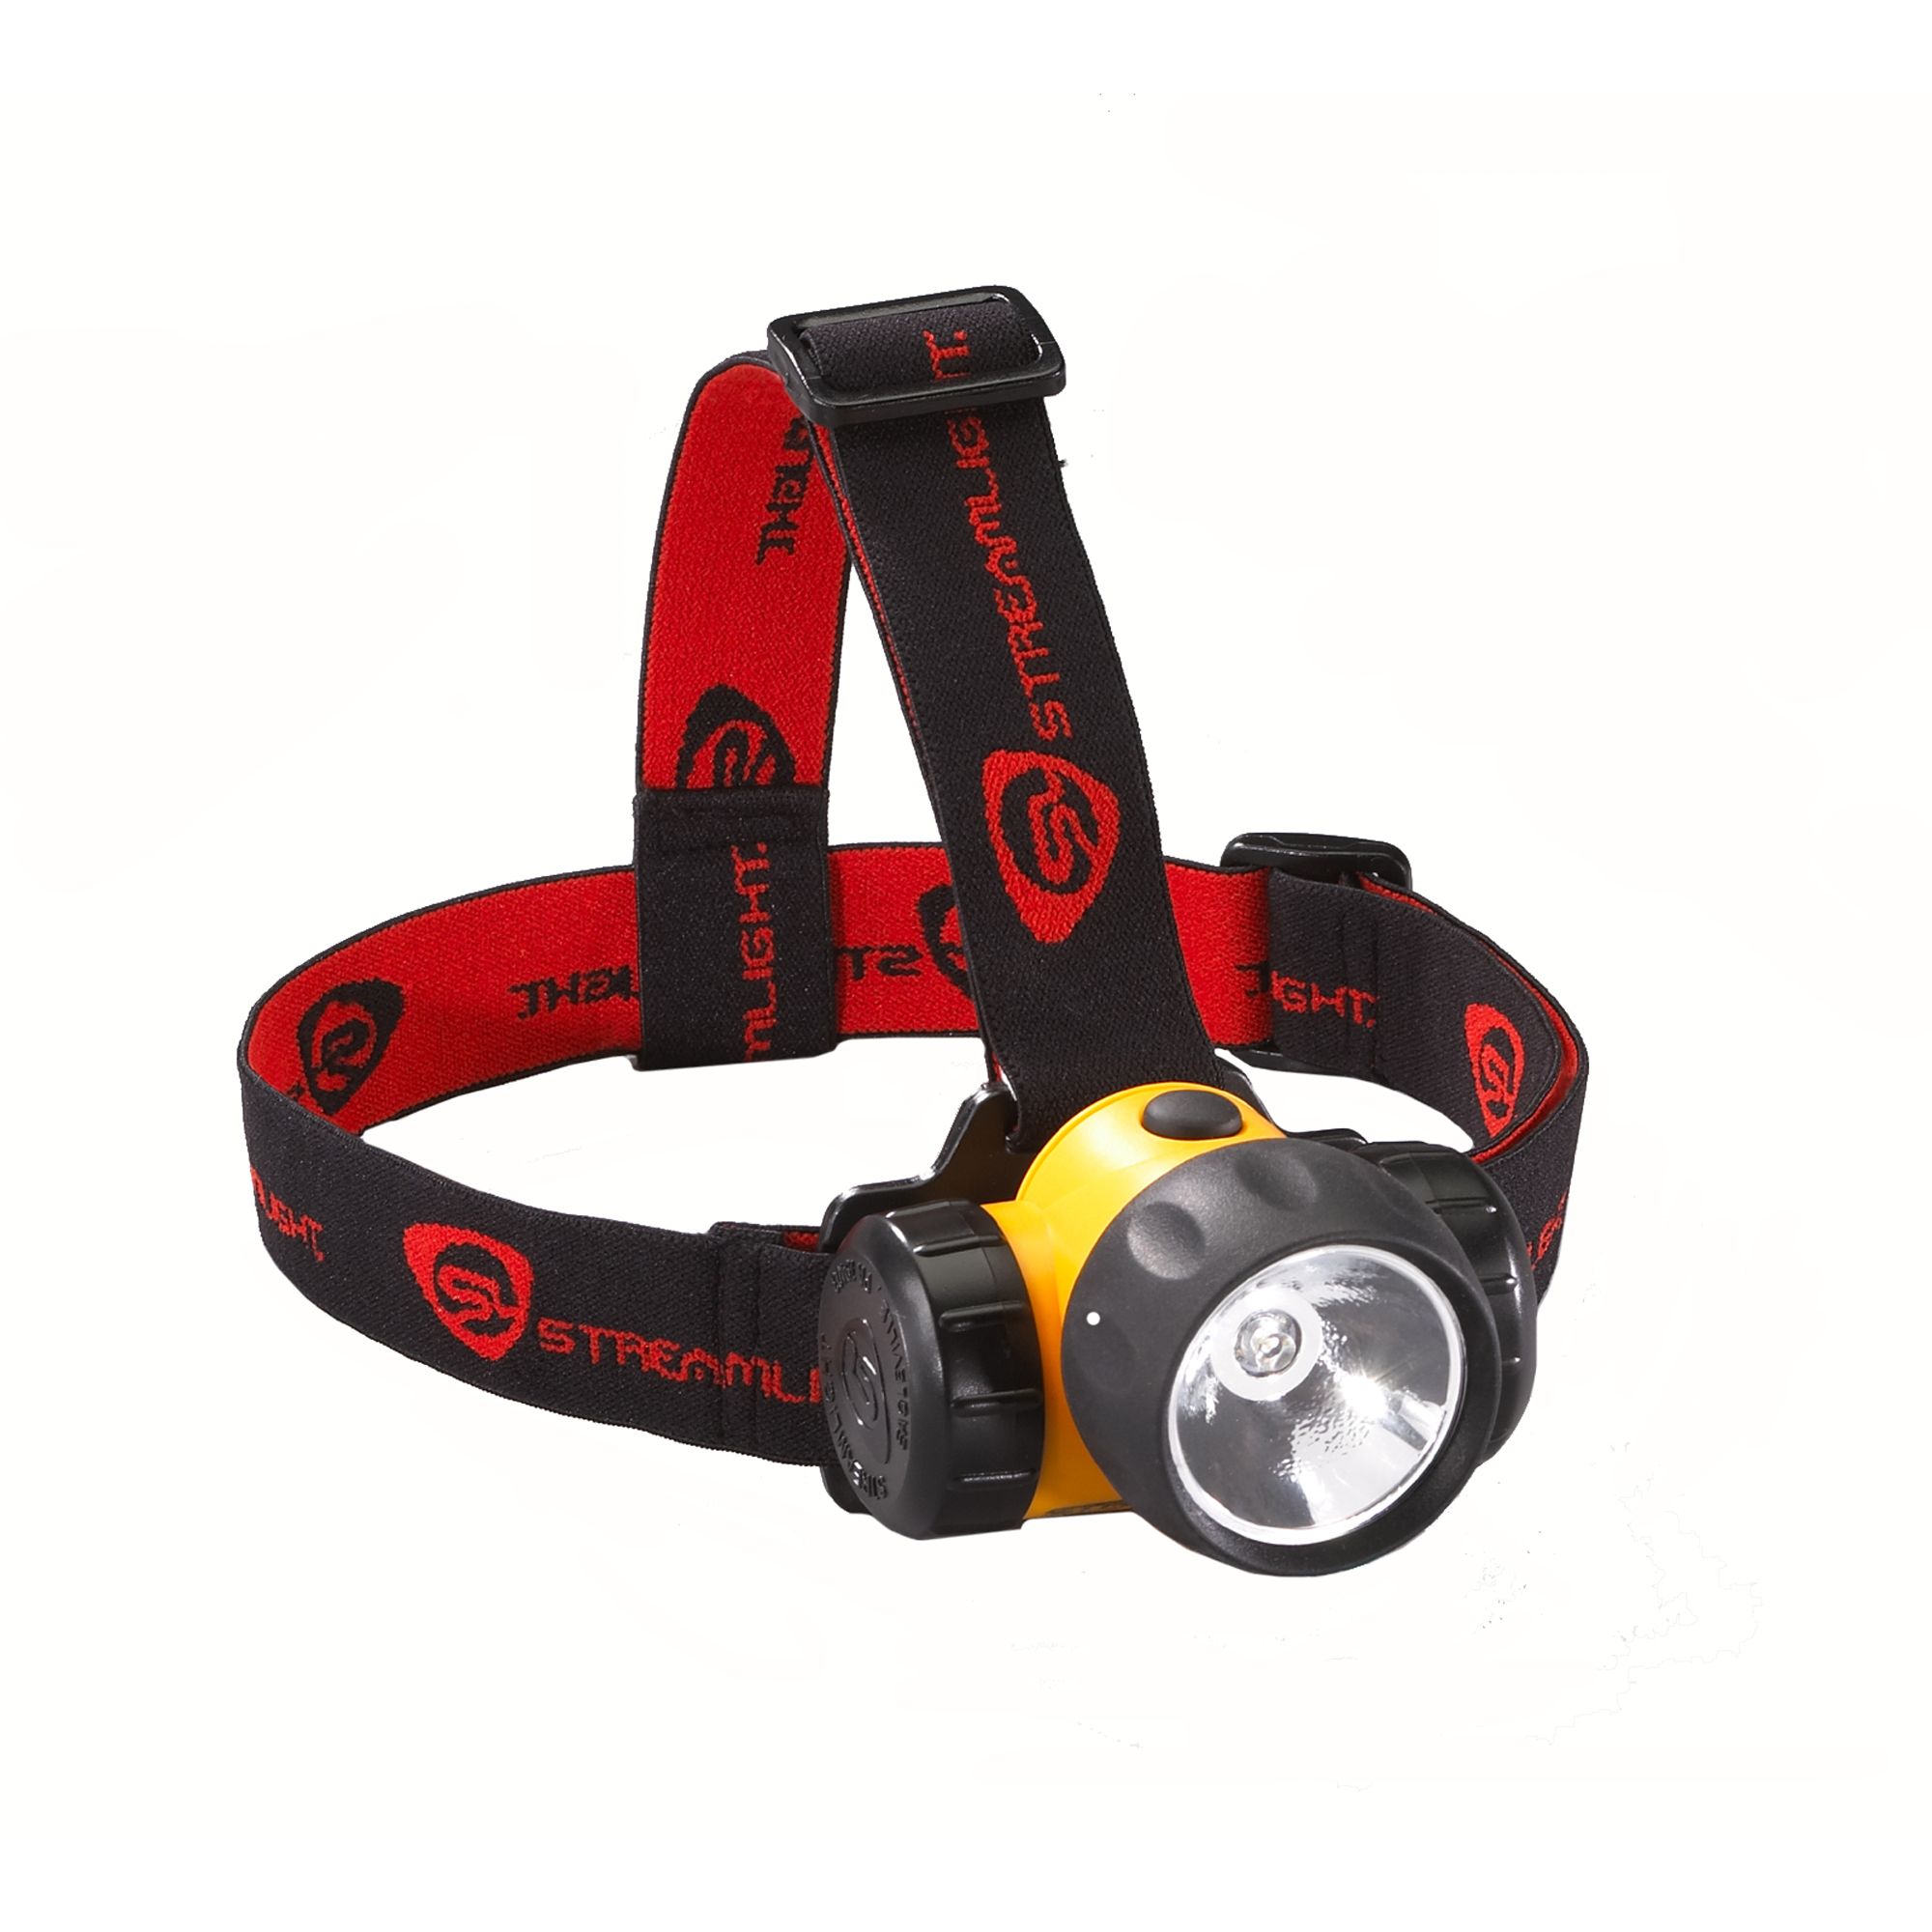 Streamlight 3AA HAZ-LO® w/Batteries Rubber & Elastic Straps, Yellow